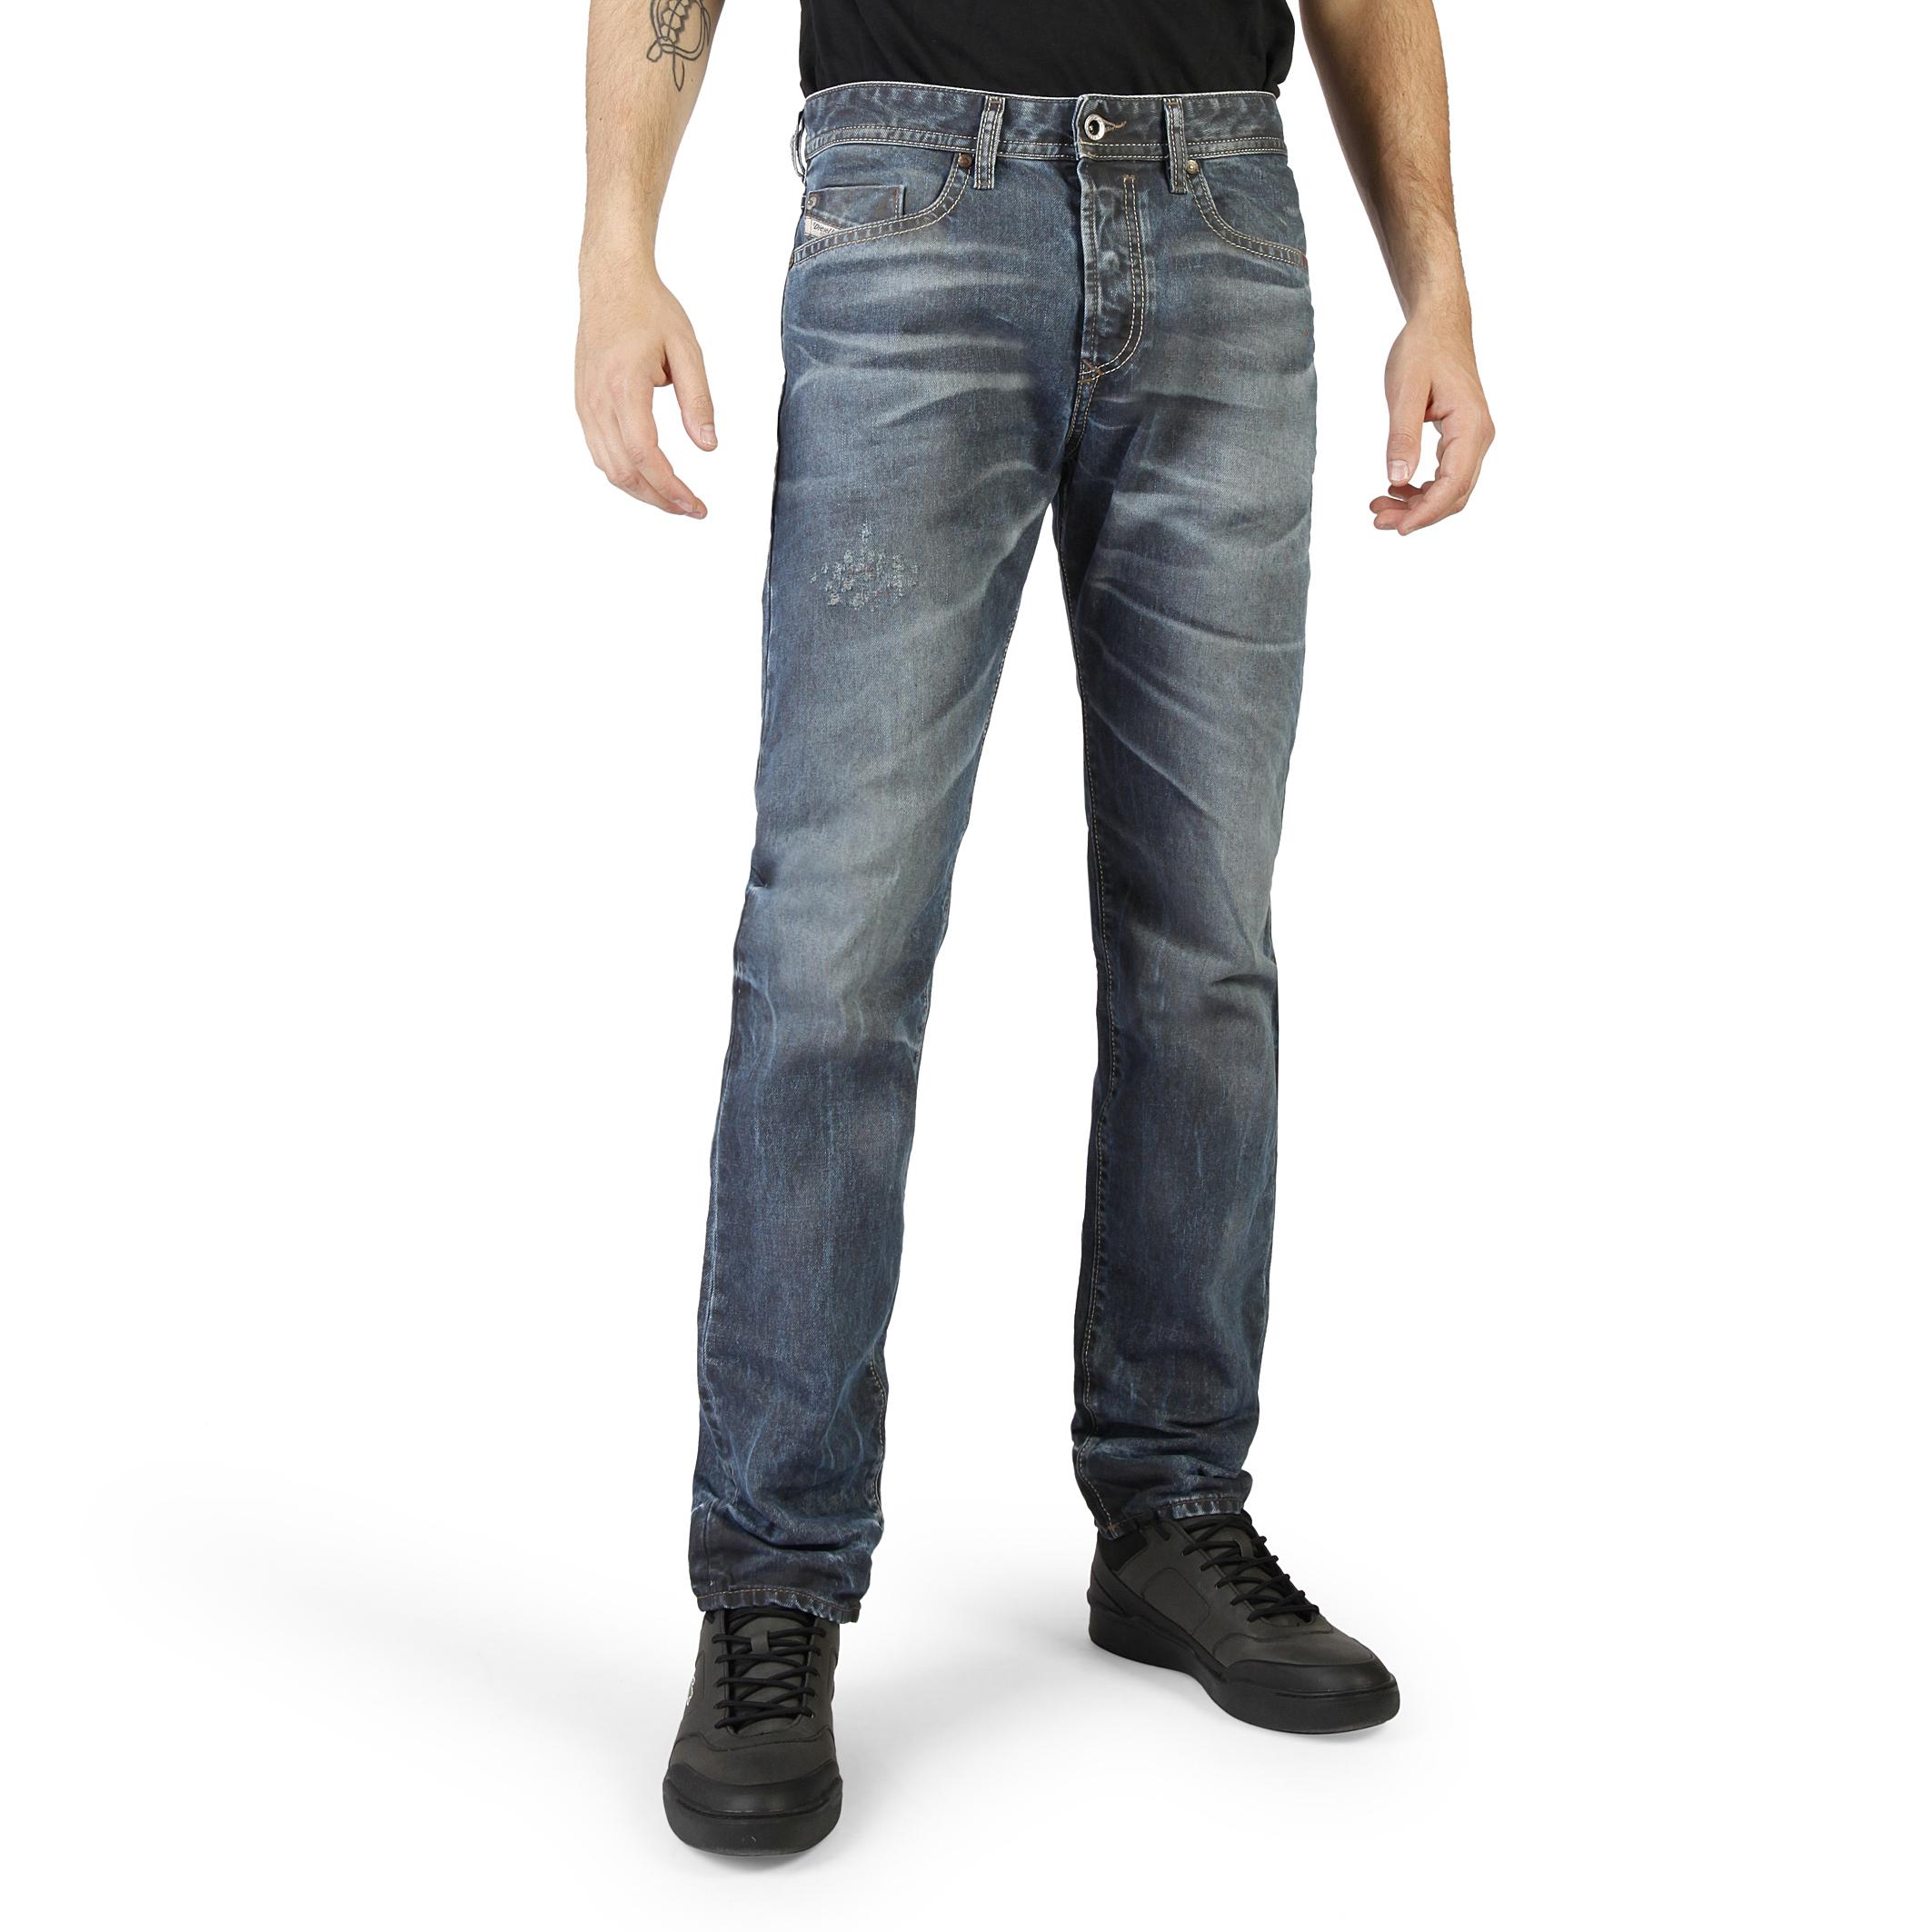 Jeans Diesel BUSTER_L32_00SDHB Uomo Blu 91450